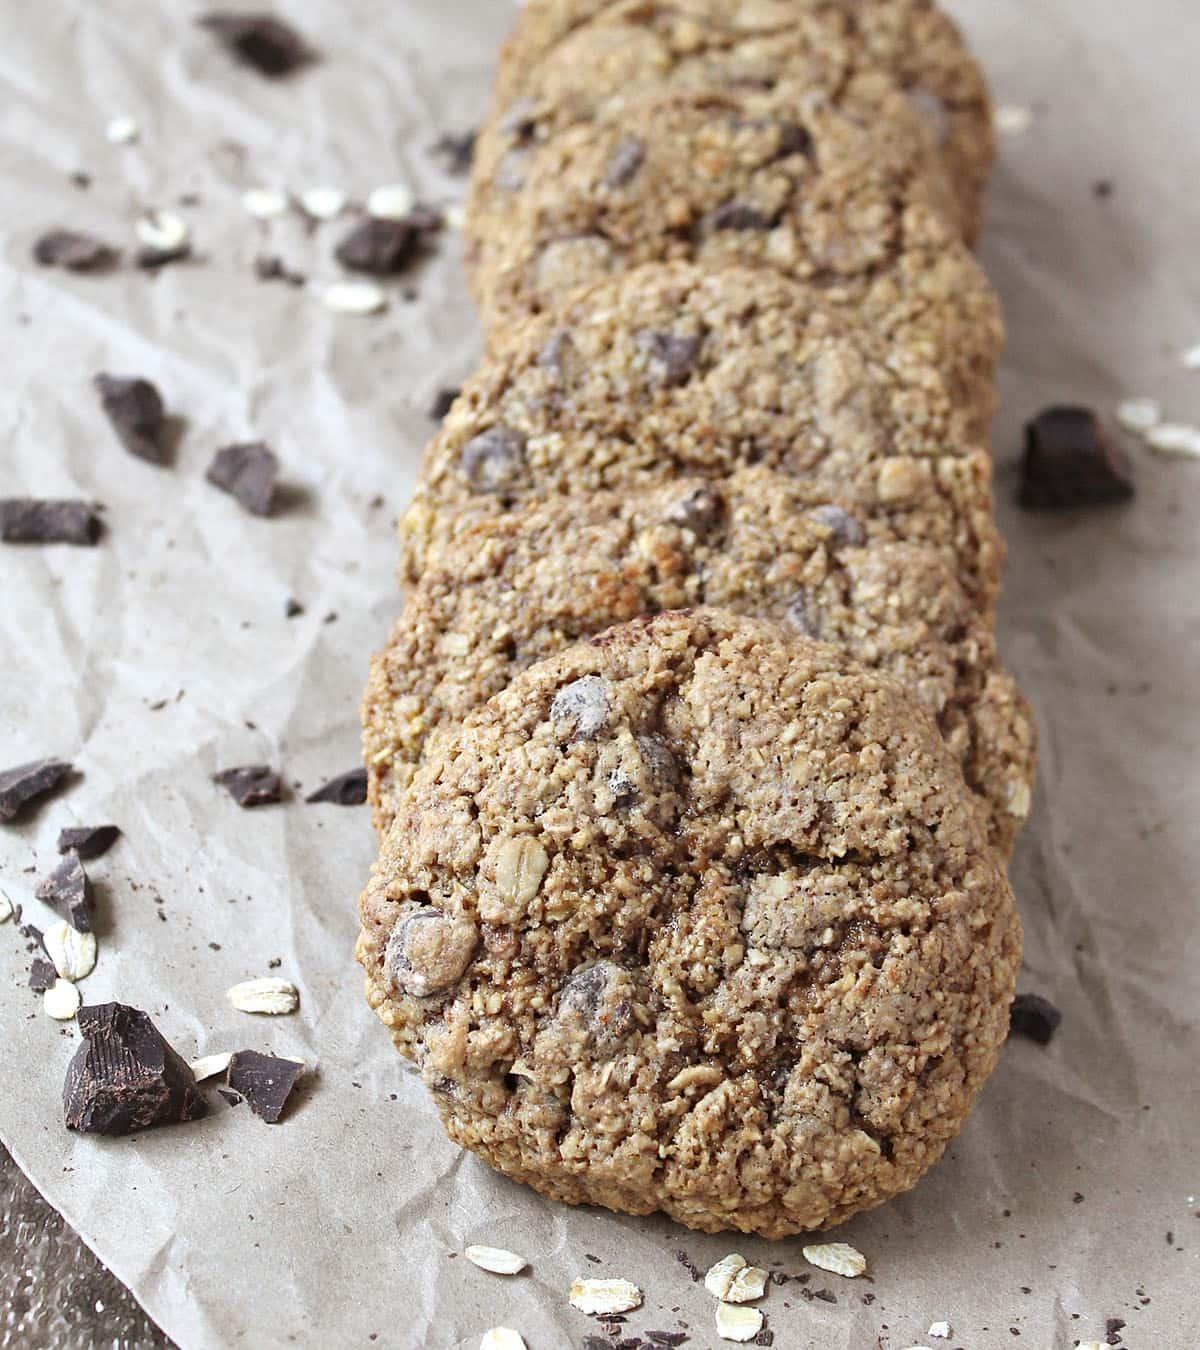 Gluten Free Chocolate Oatmeal Cookies